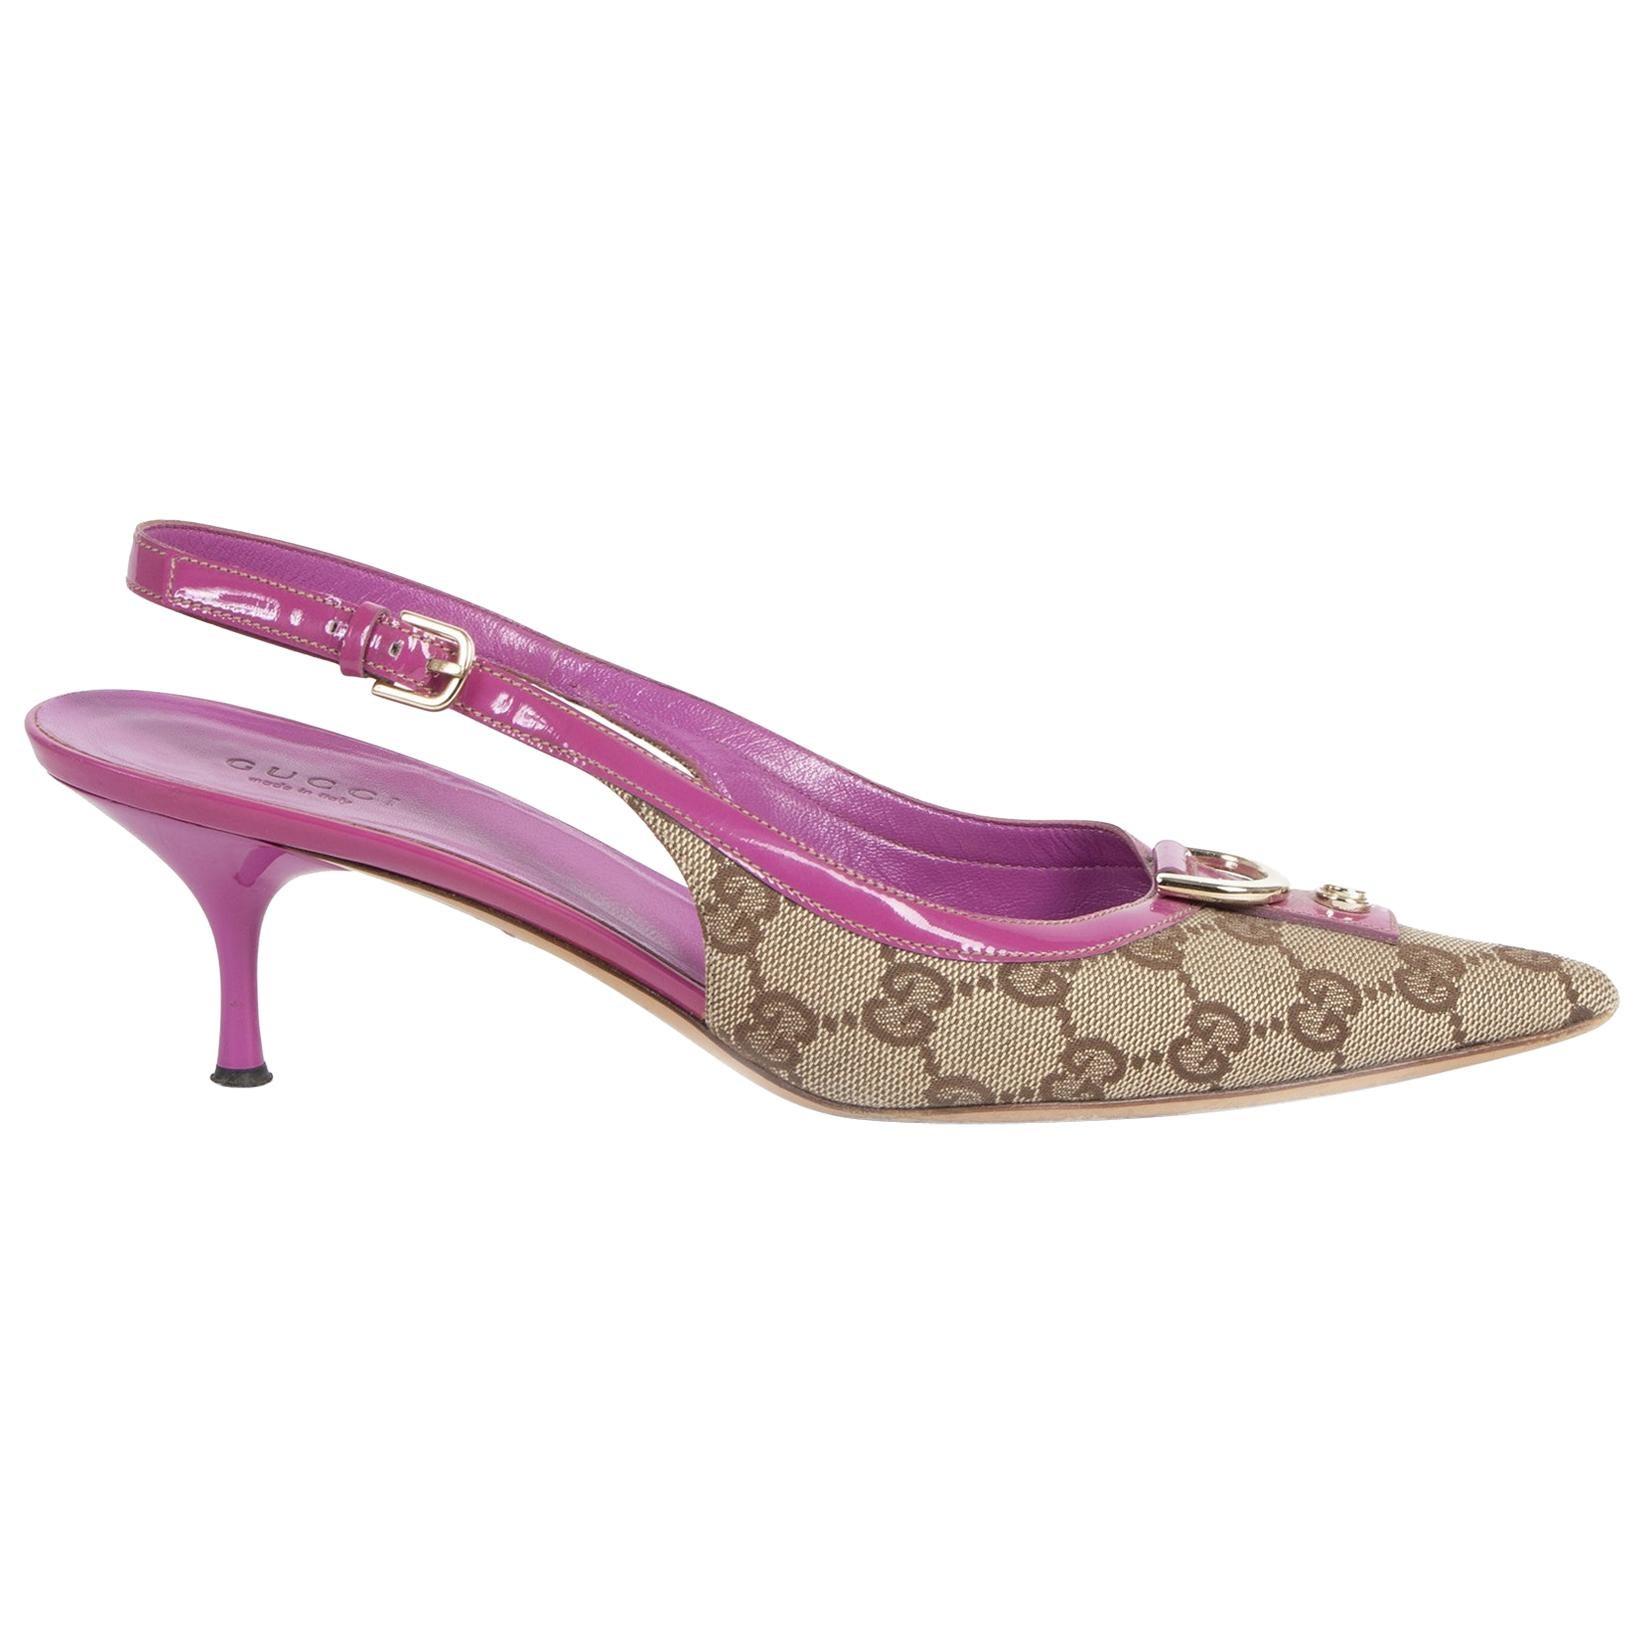 Gucci Monogram Pink Kitten Heels - Size 38